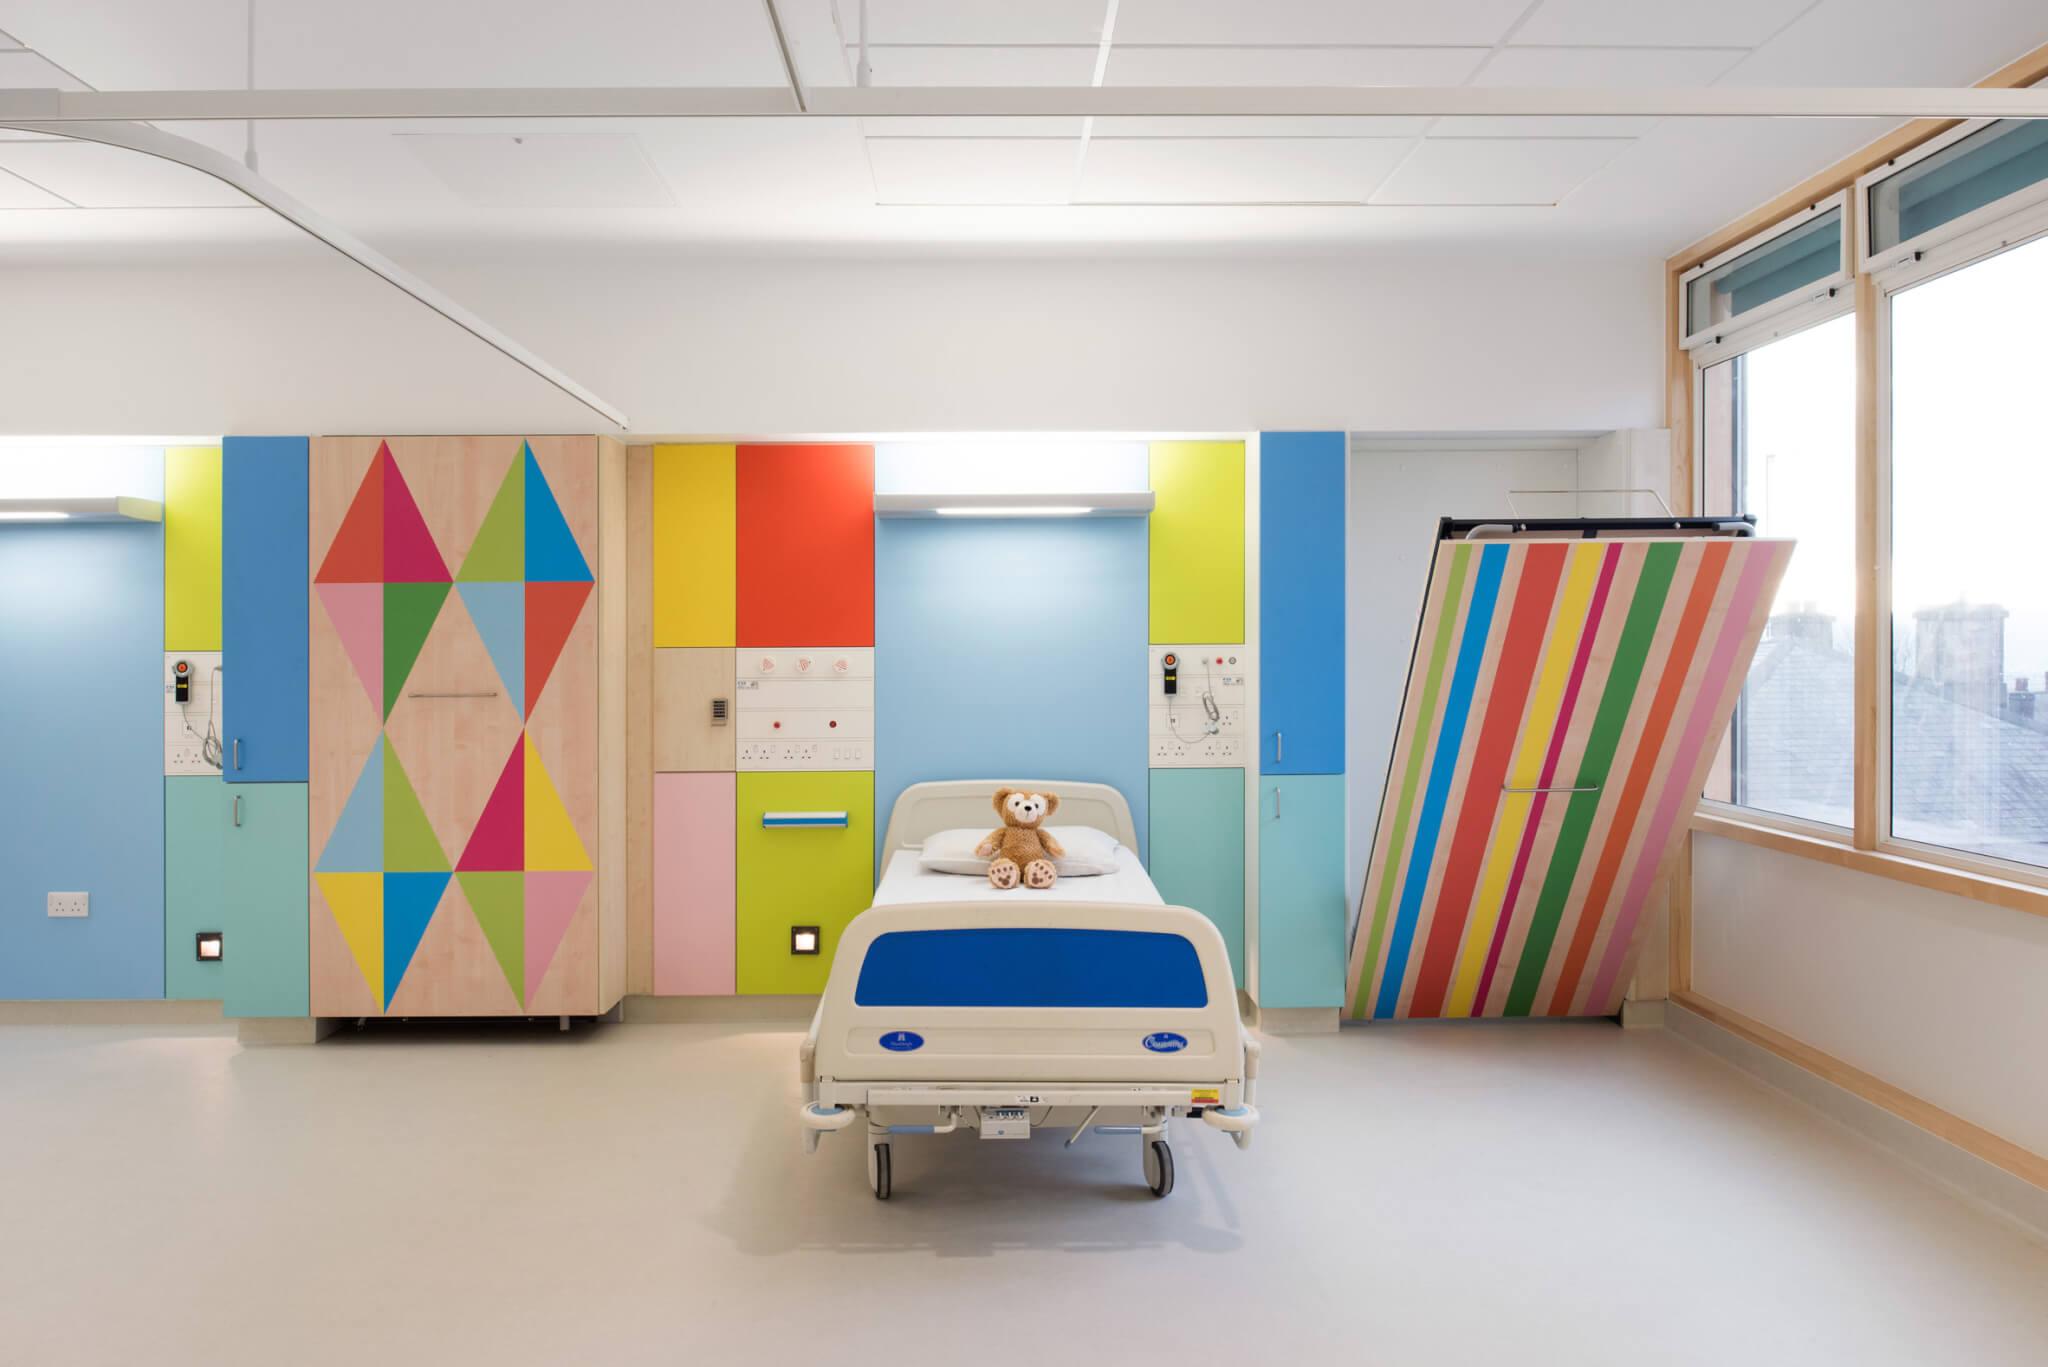 Sheffield Children's Hospital病房像睡房般親切,幾何圖案適合不同年紀孩子。